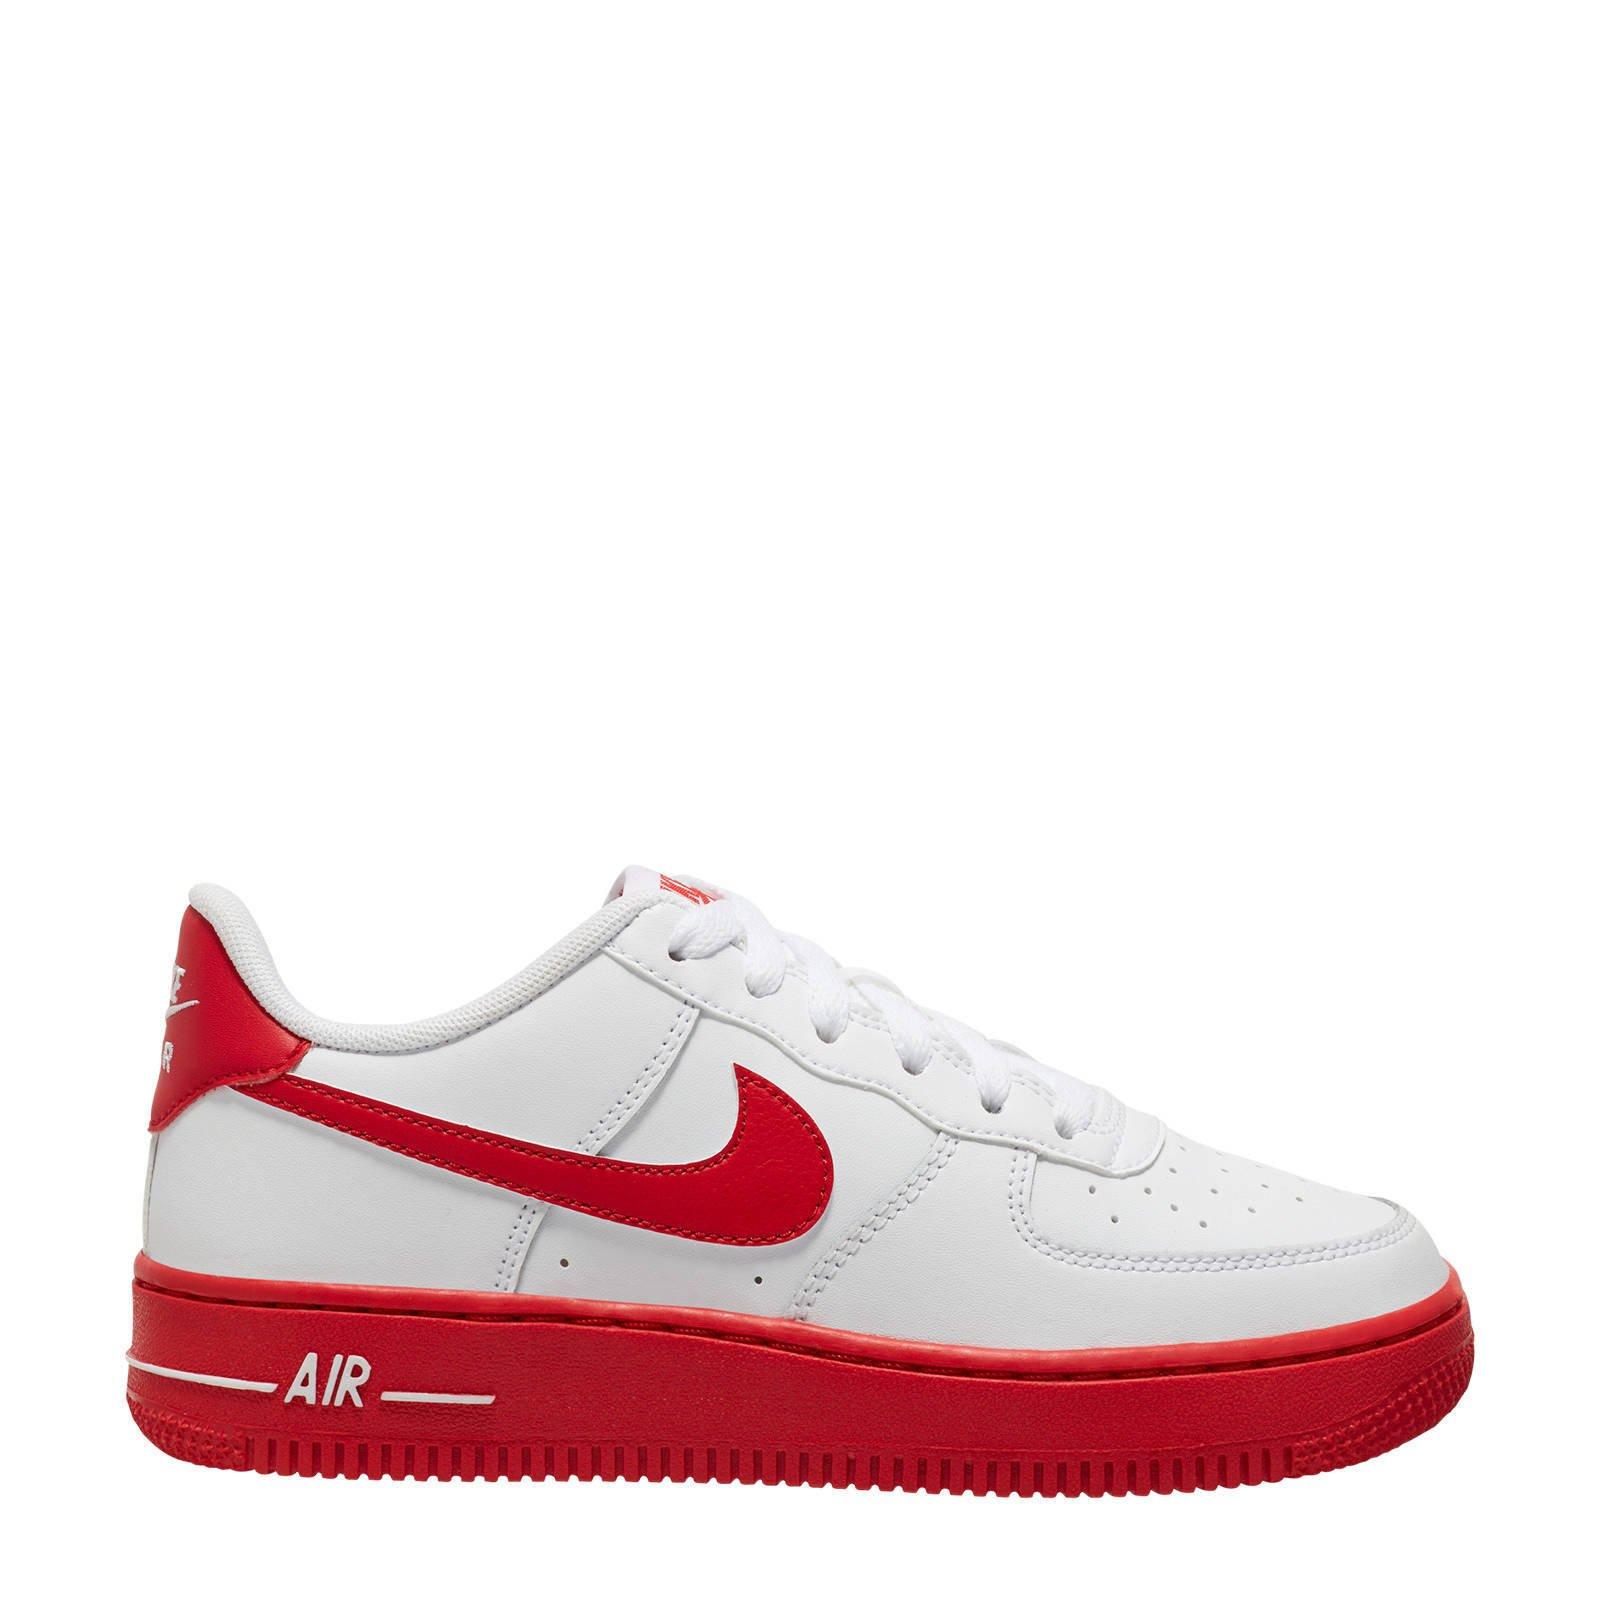 Nike Air Force 1 leren sneakers wit/rood | wehkamp